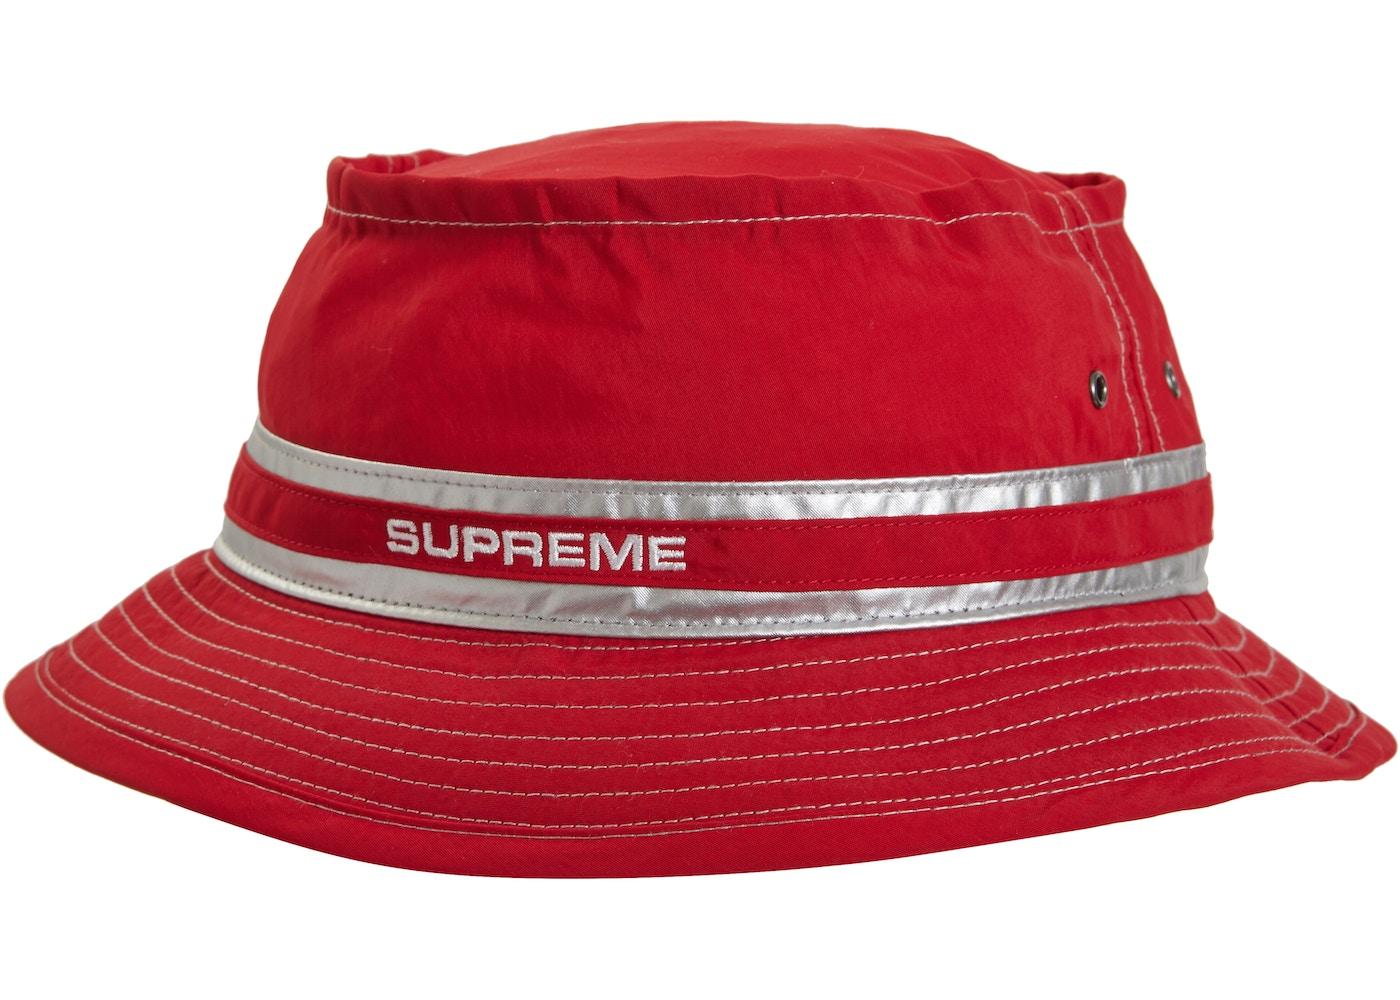 6474a8c3e52a93 Supreme Headwear - Buy & Sell Streetwear